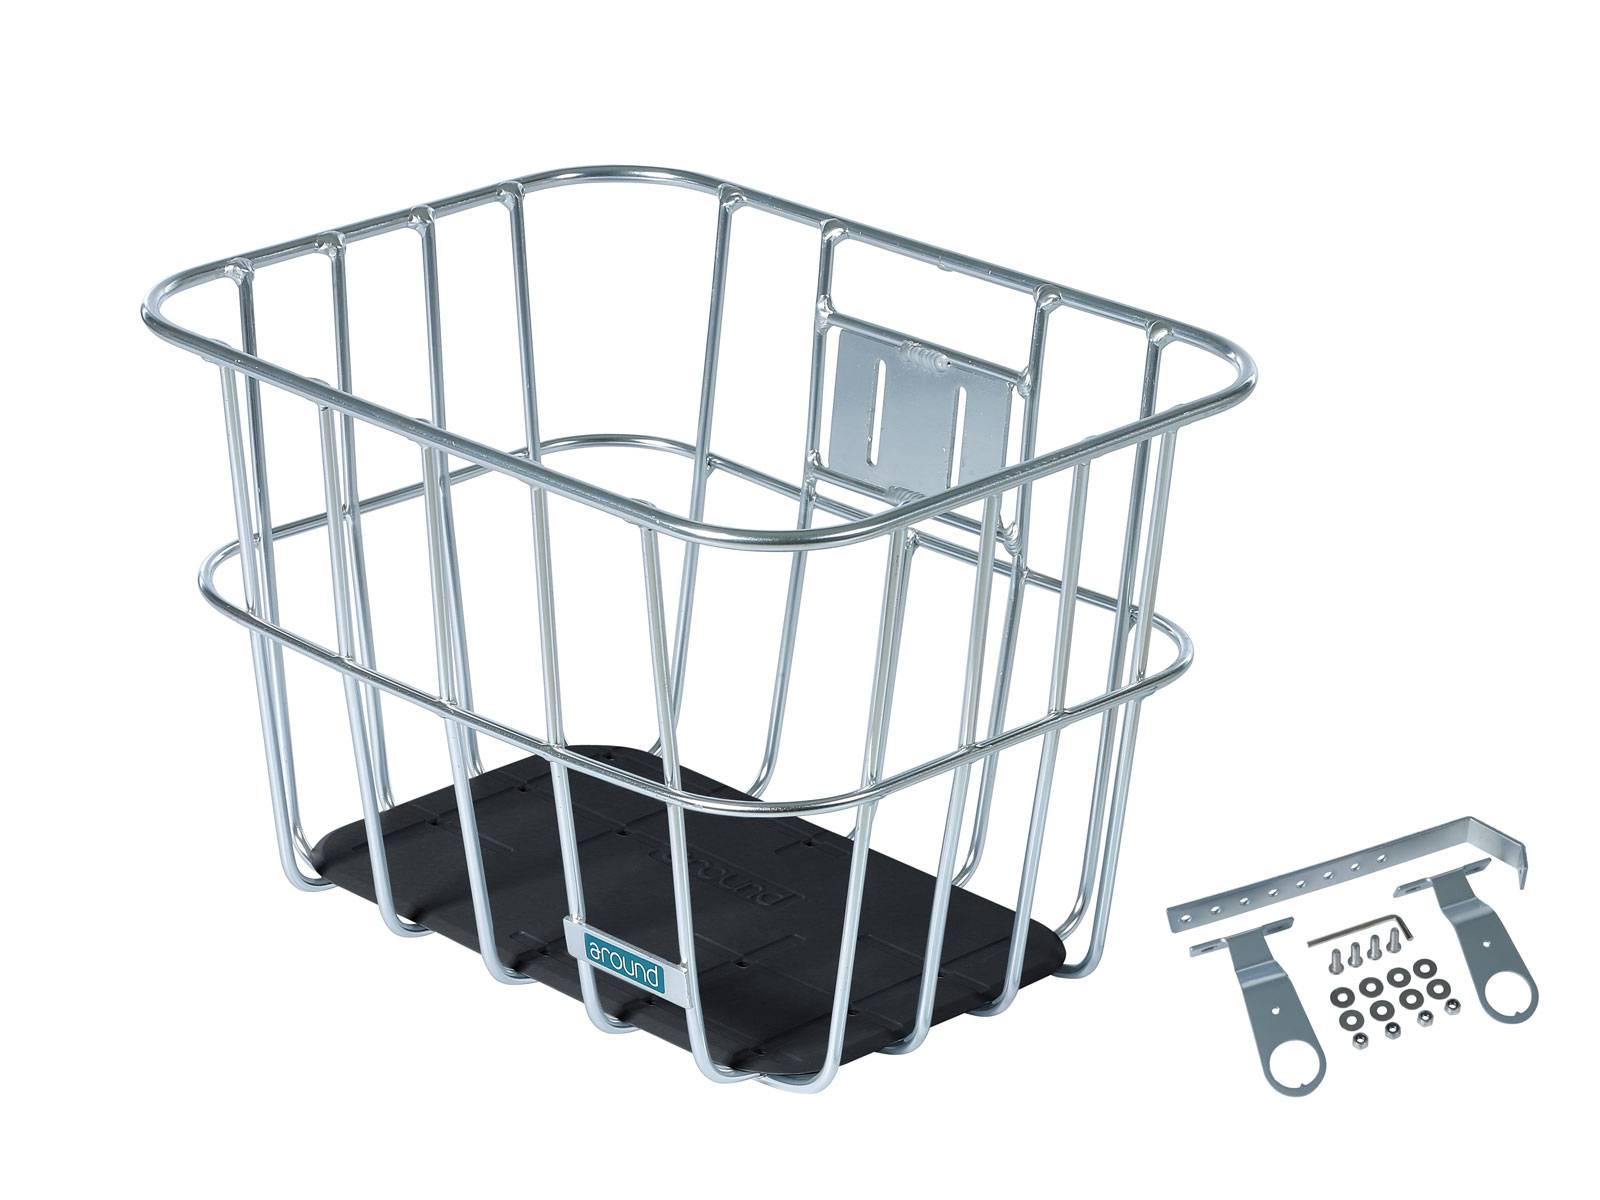 AROUND Fahrradkorb vorne ACE VR ALU FIX inkl. Befestigungsmaterial, Alu